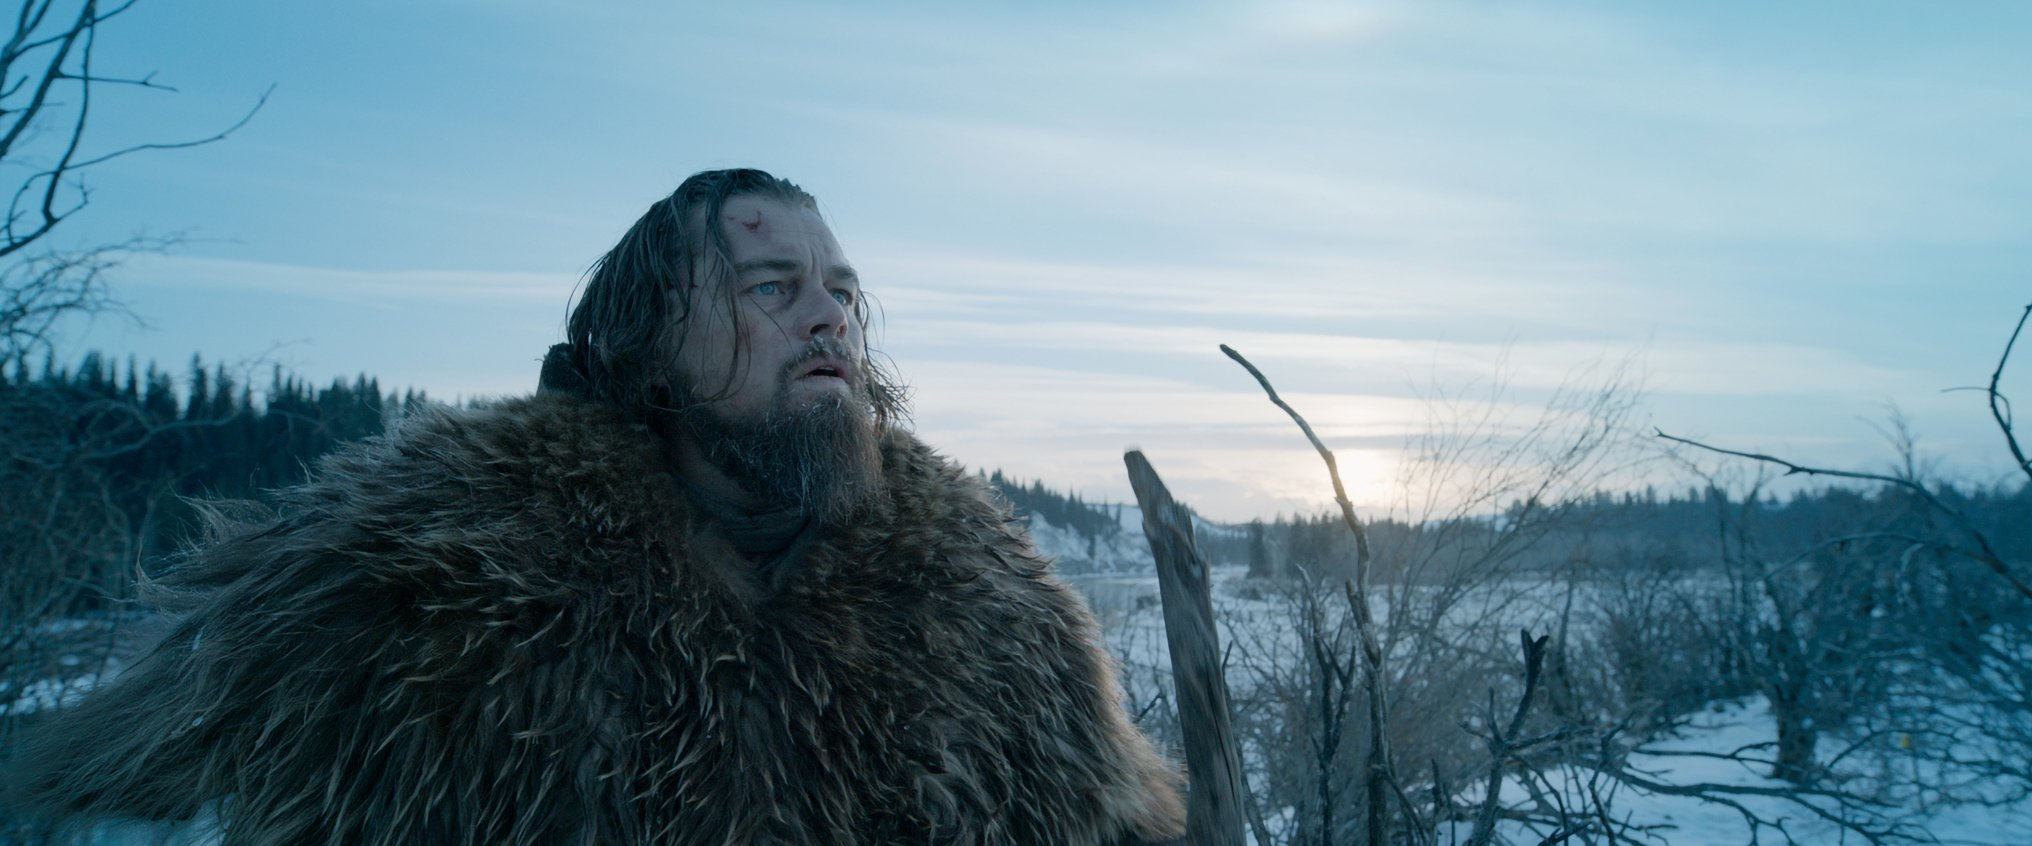 Leonardo DiCaprio's 'The Revenant' scores at box office, but 'Star Wars' still No. 1